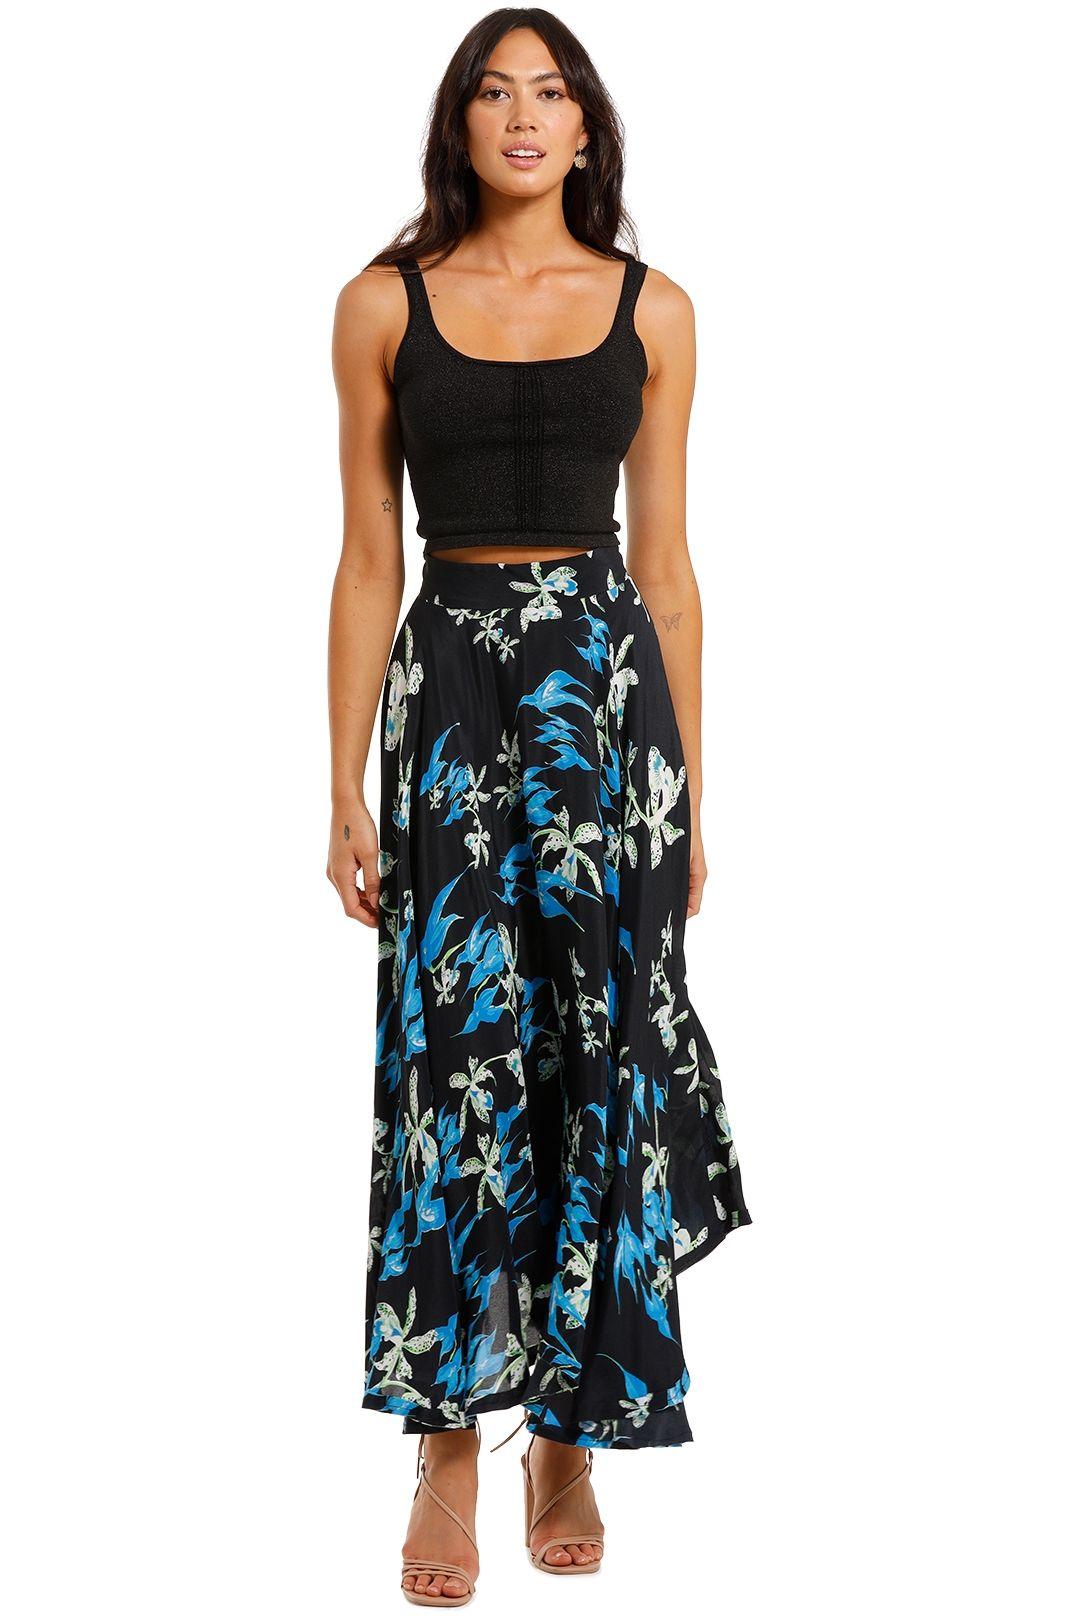 KITX Circle Skirt floral